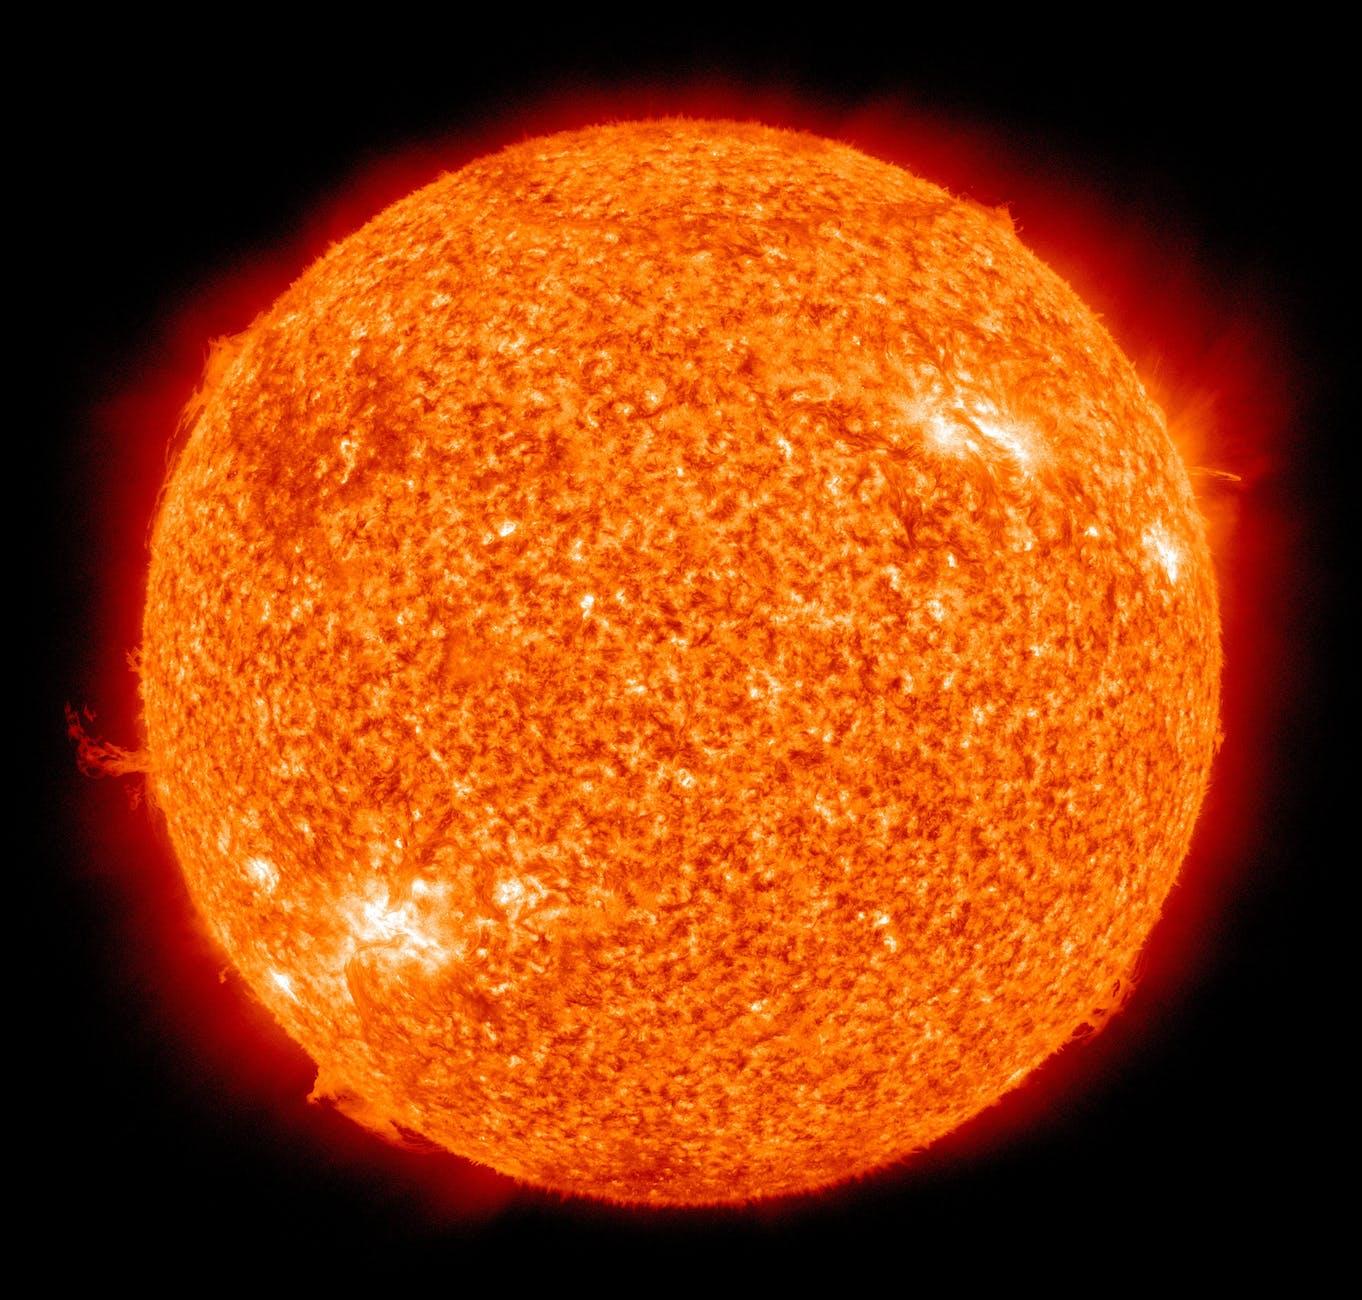 Sun,EARTH WILL TURN INTO FIREBALL BY 2600